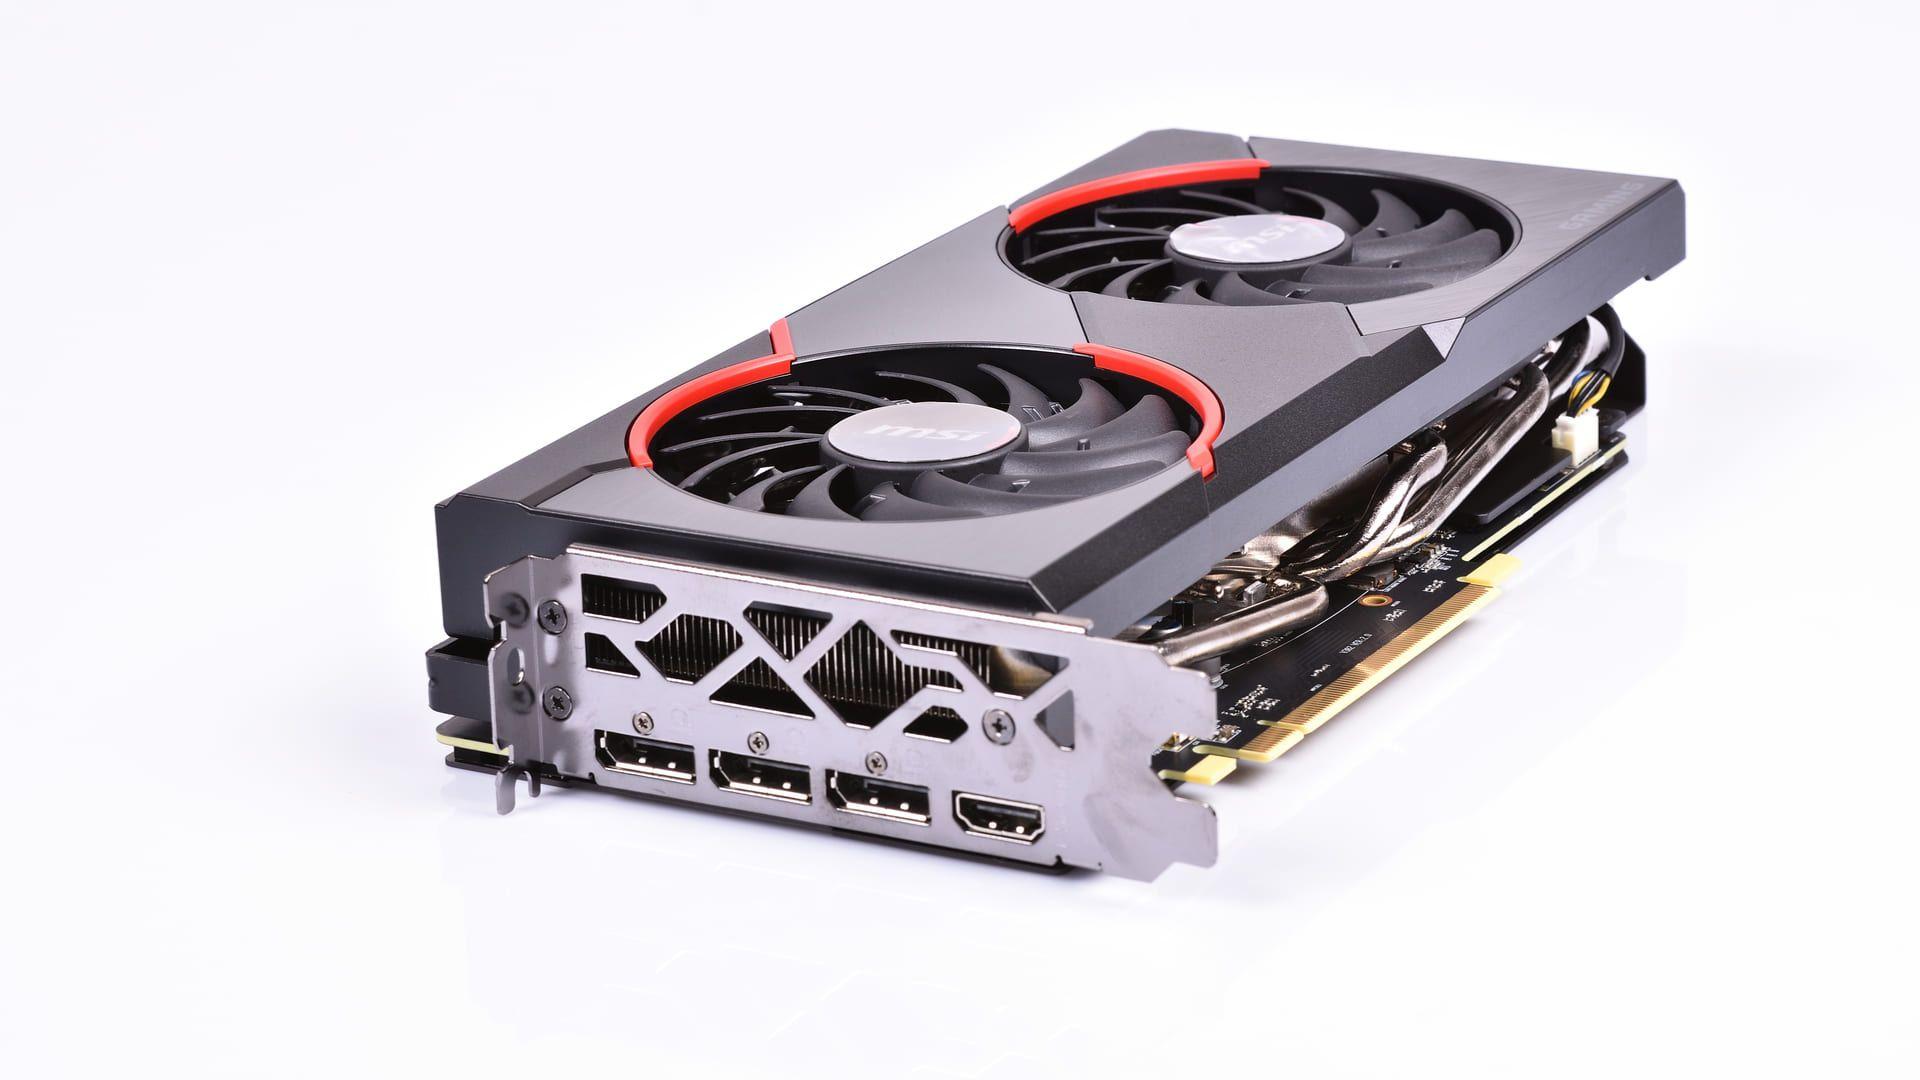 Placa de vídeo AMD trouxe avanços para época de lançamento (Foto: ekremozturk / Shutterstock)